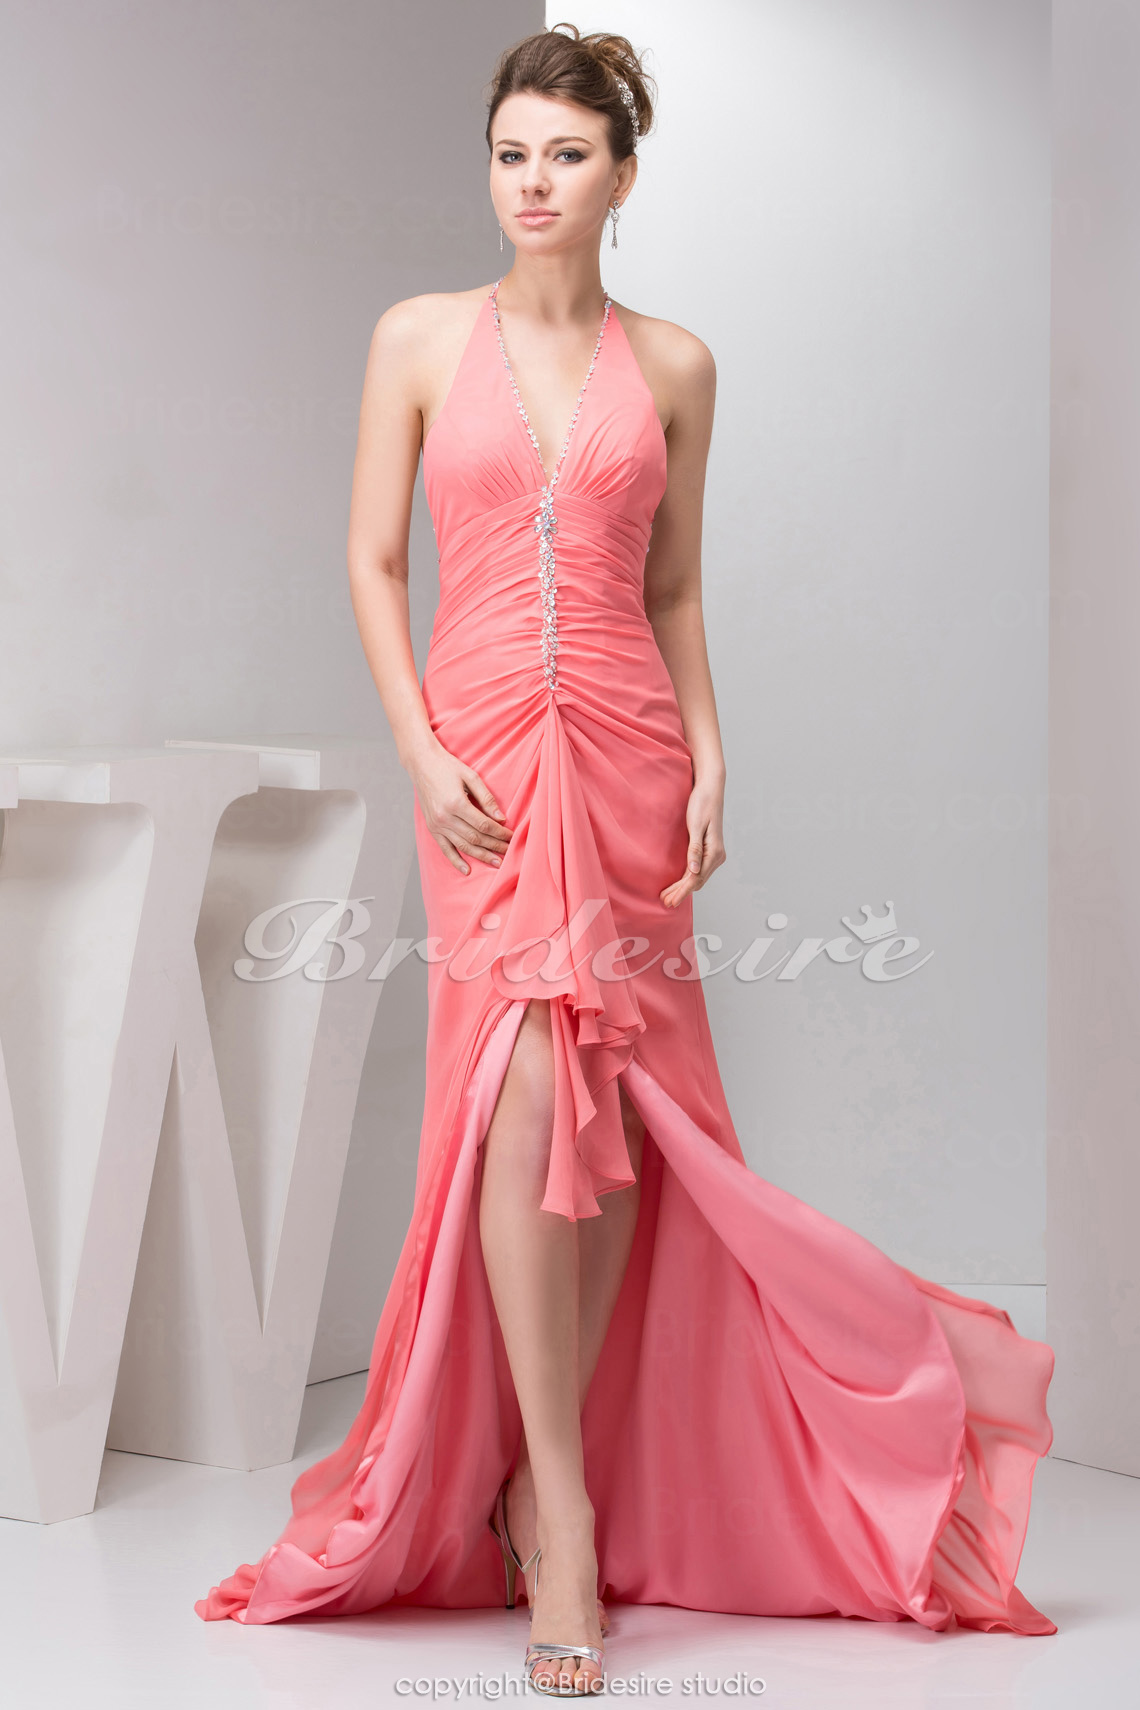 Bridesire - Corte A Asimétrico Gasa Strapless Vestido de dama de ...